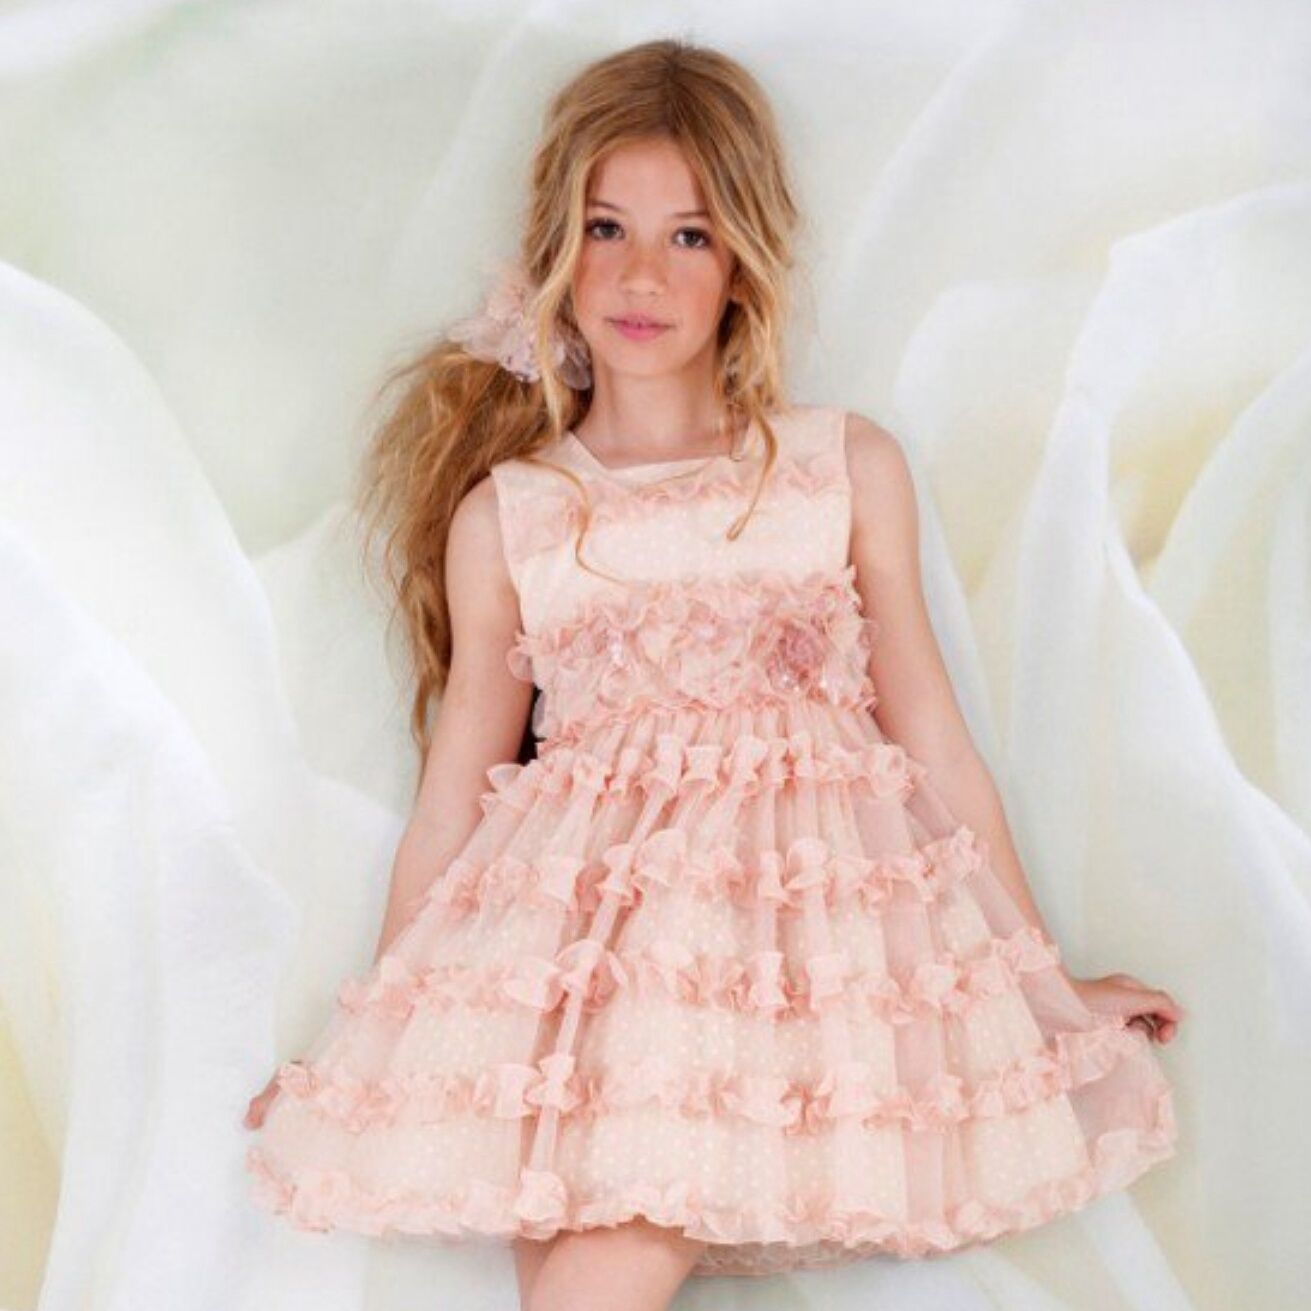 Flower girl dress. Vestido ceremonia niña. | Cap-Ras. Vestidos de ...